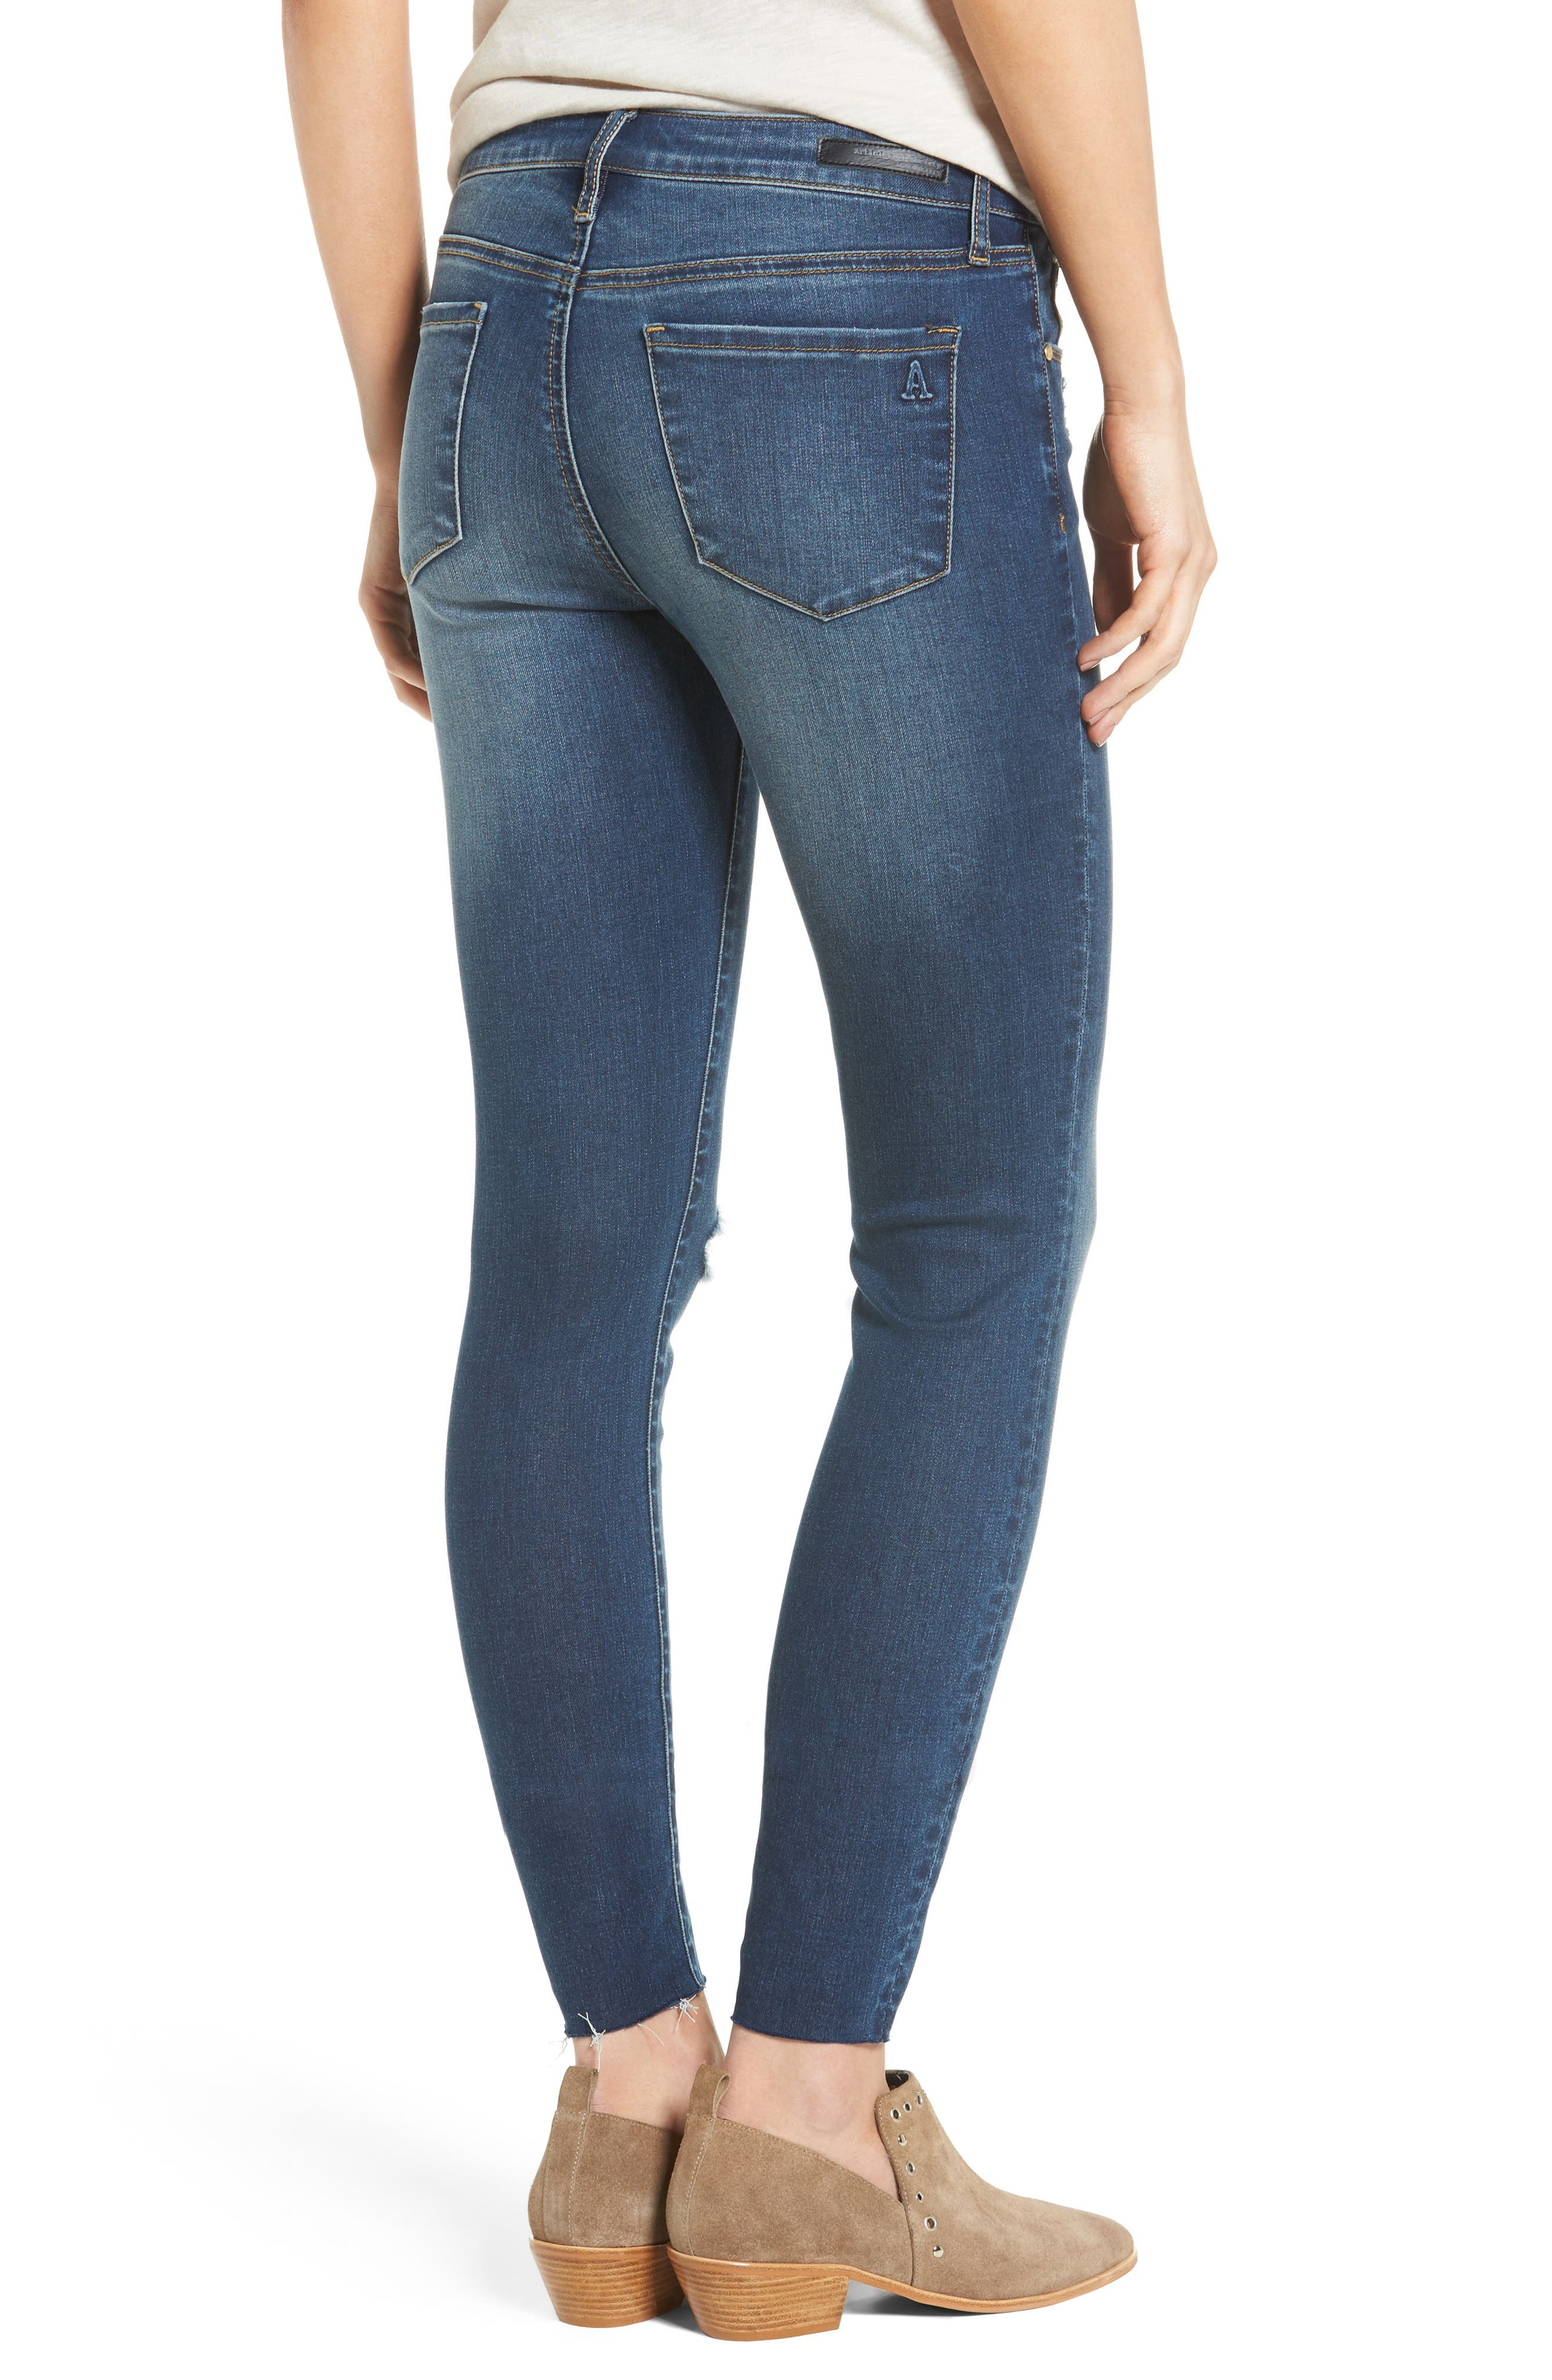 Alternate Image 3  - Articles of Society Sarah Skinny Jeans (Vintage)